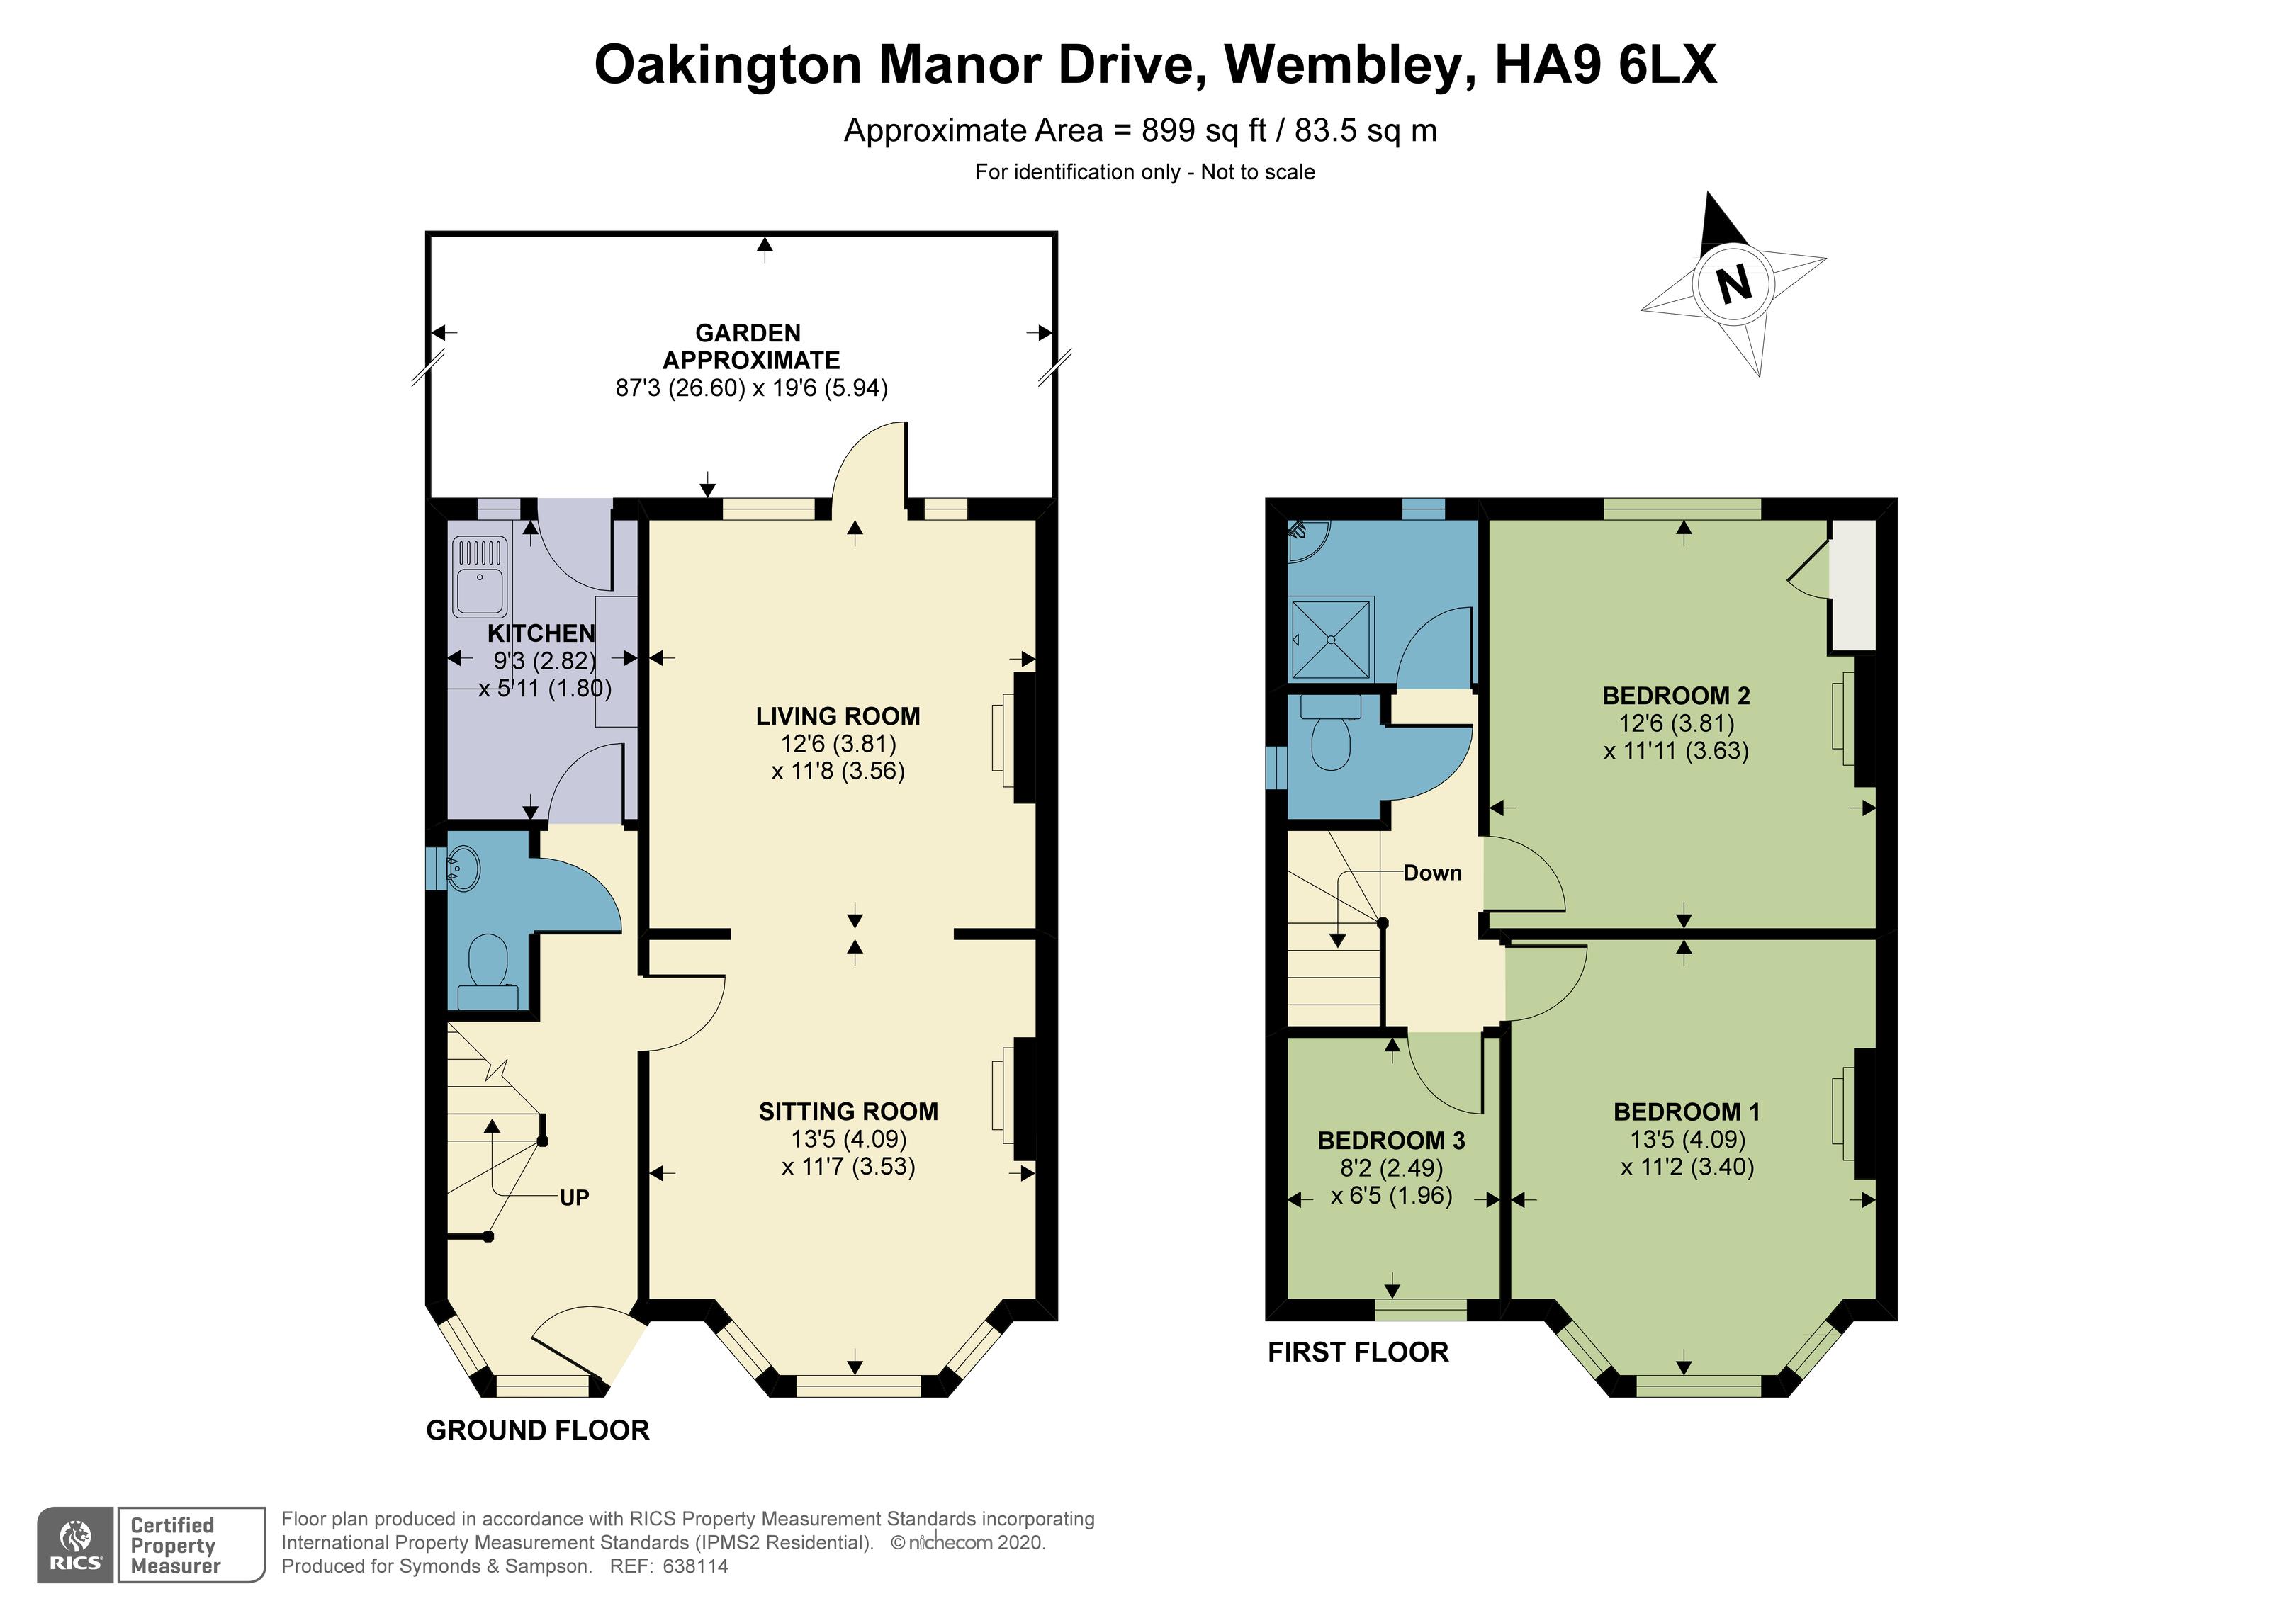 Floorplan - Oakington Manor Drive, Wembley, HA9 6LX